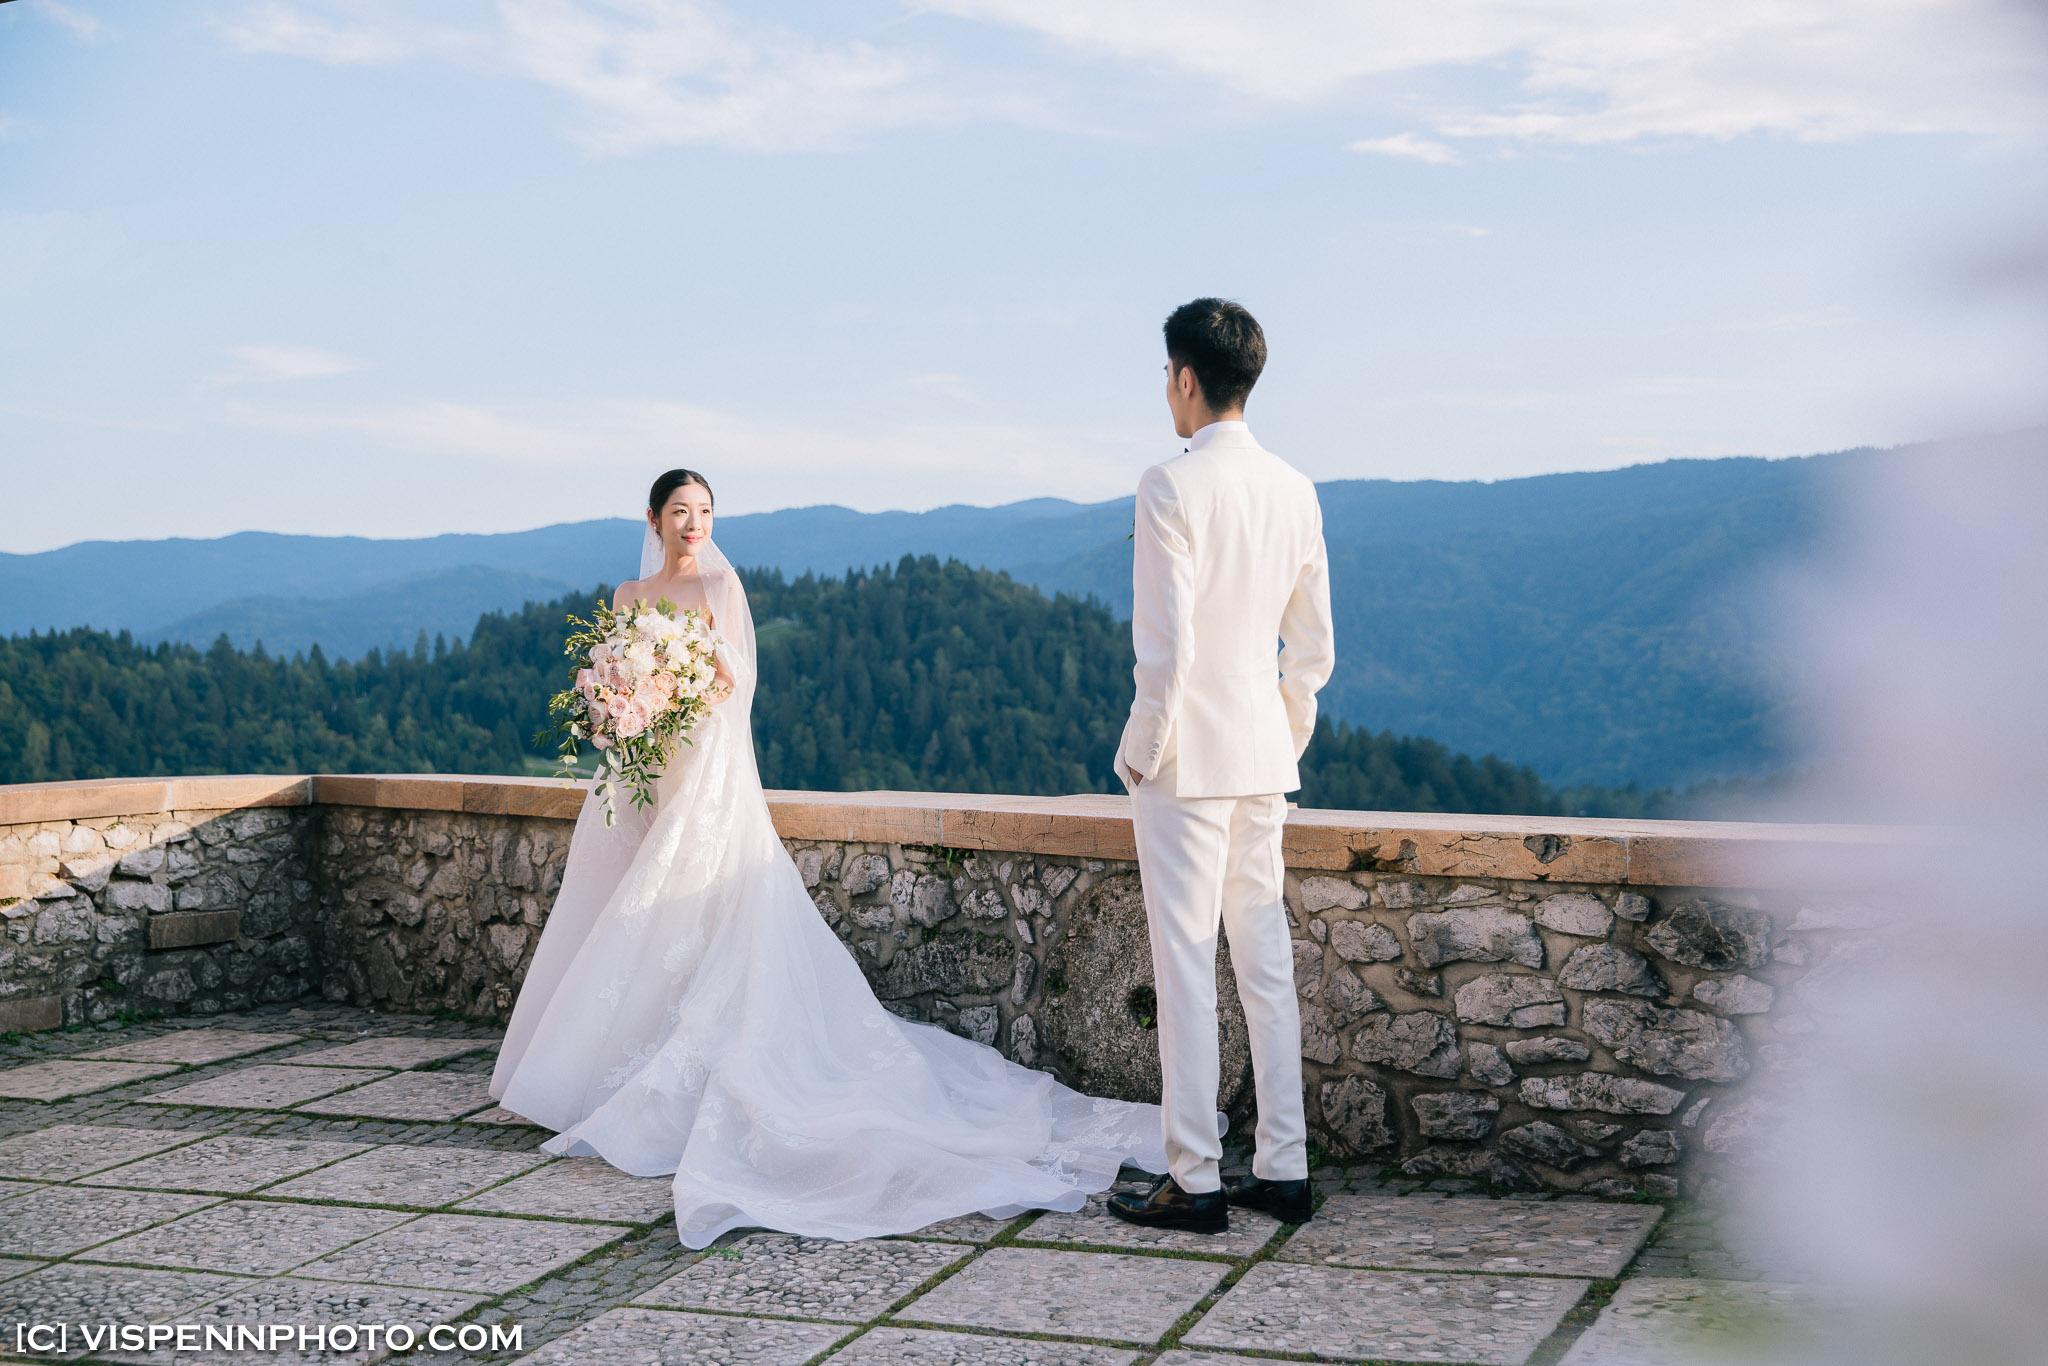 PRE WEDDING Photography Melbourne VISPENN 墨尔本 婚纱照 结婚照 婚纱摄影 DSC04111